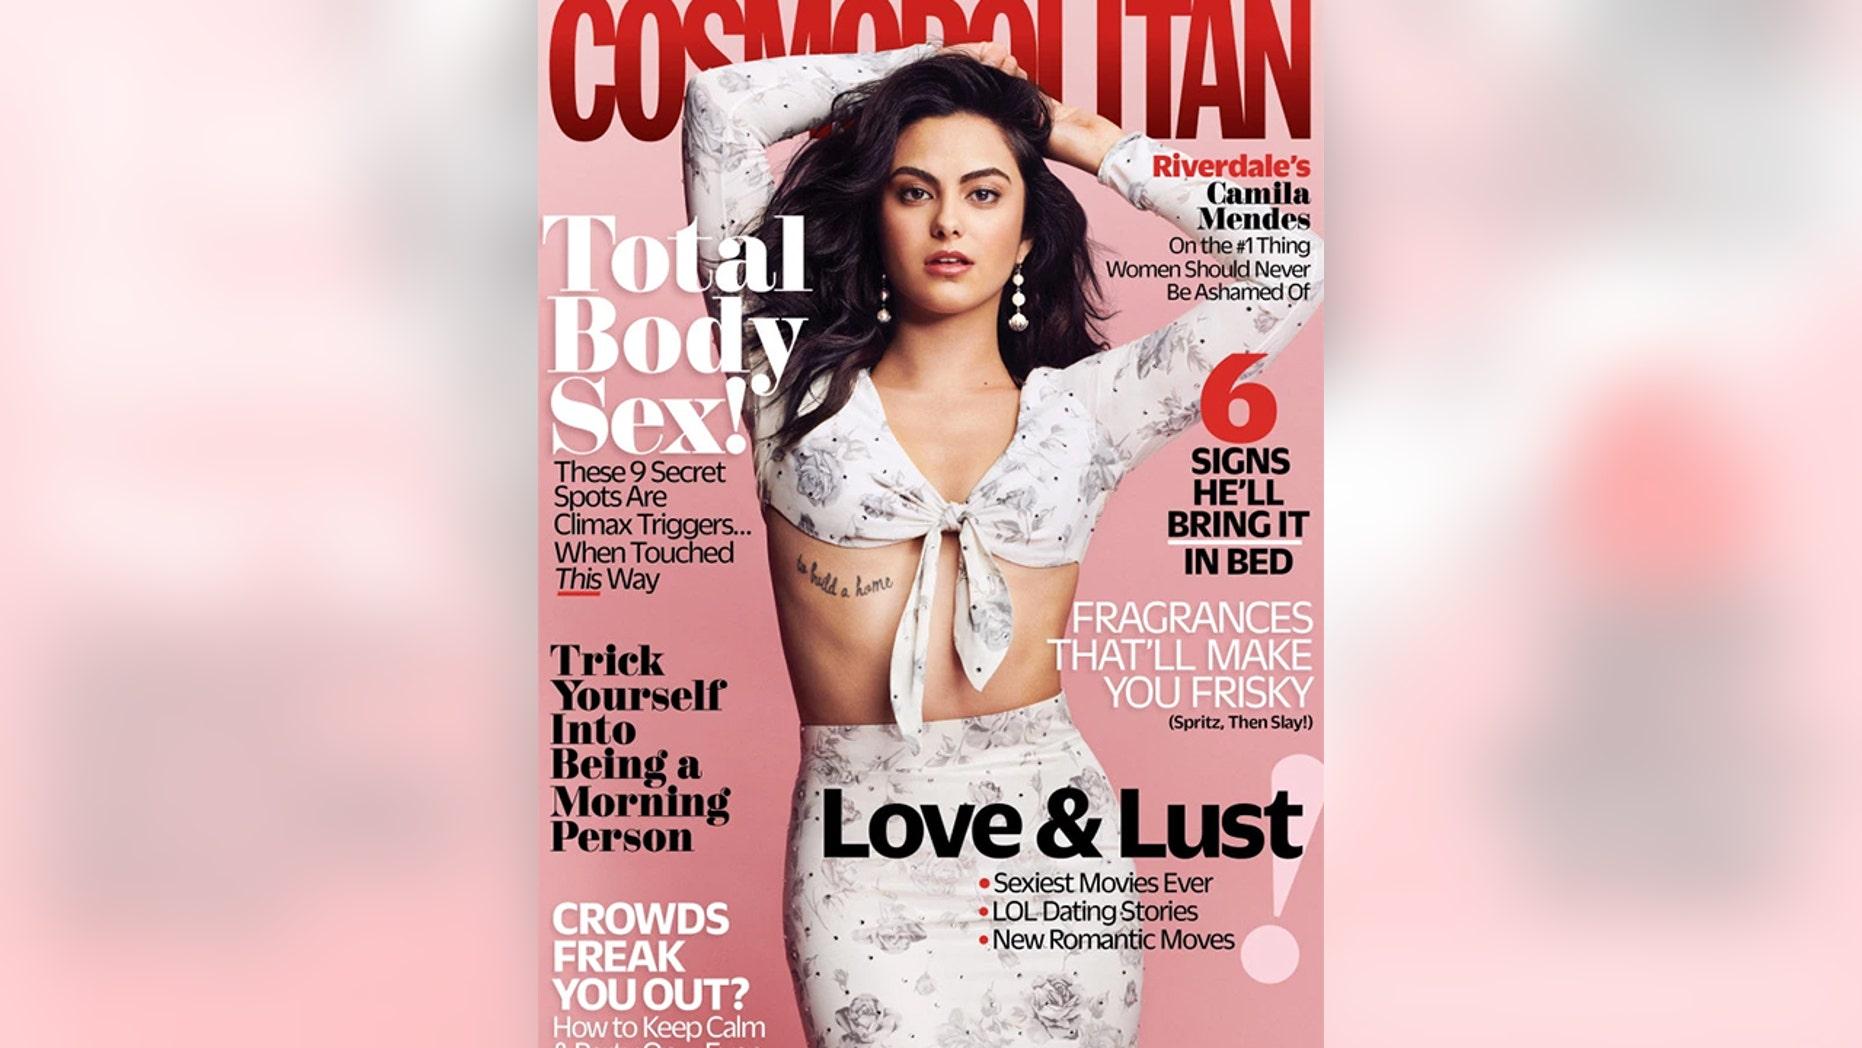 """Riverdale"" star Camila Mendes graces the cover of Cosmopolitan."